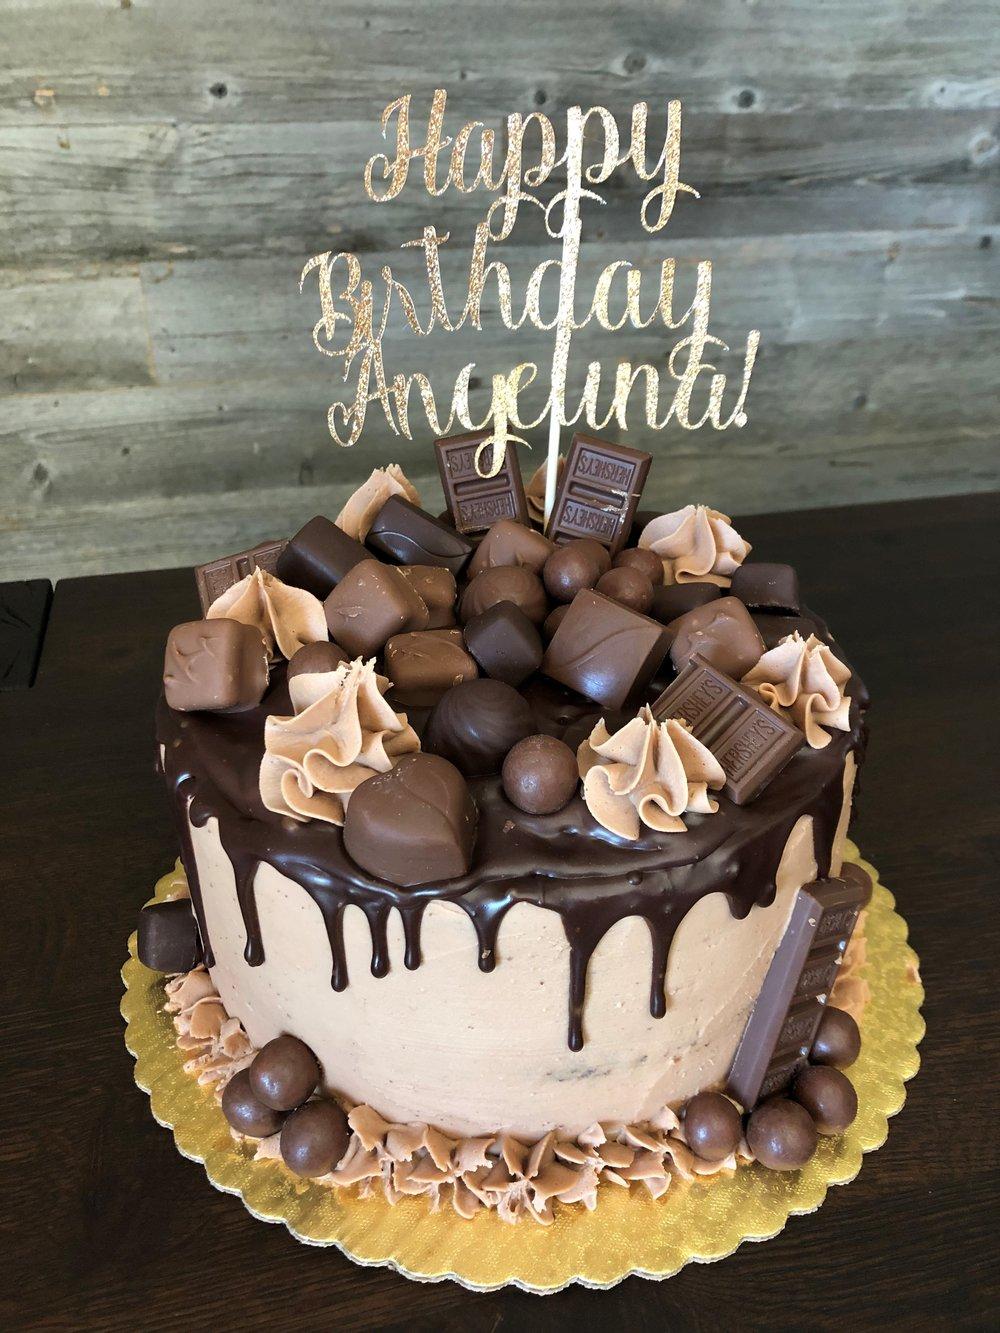 Chocolate cake with chocolate decorations.jpg